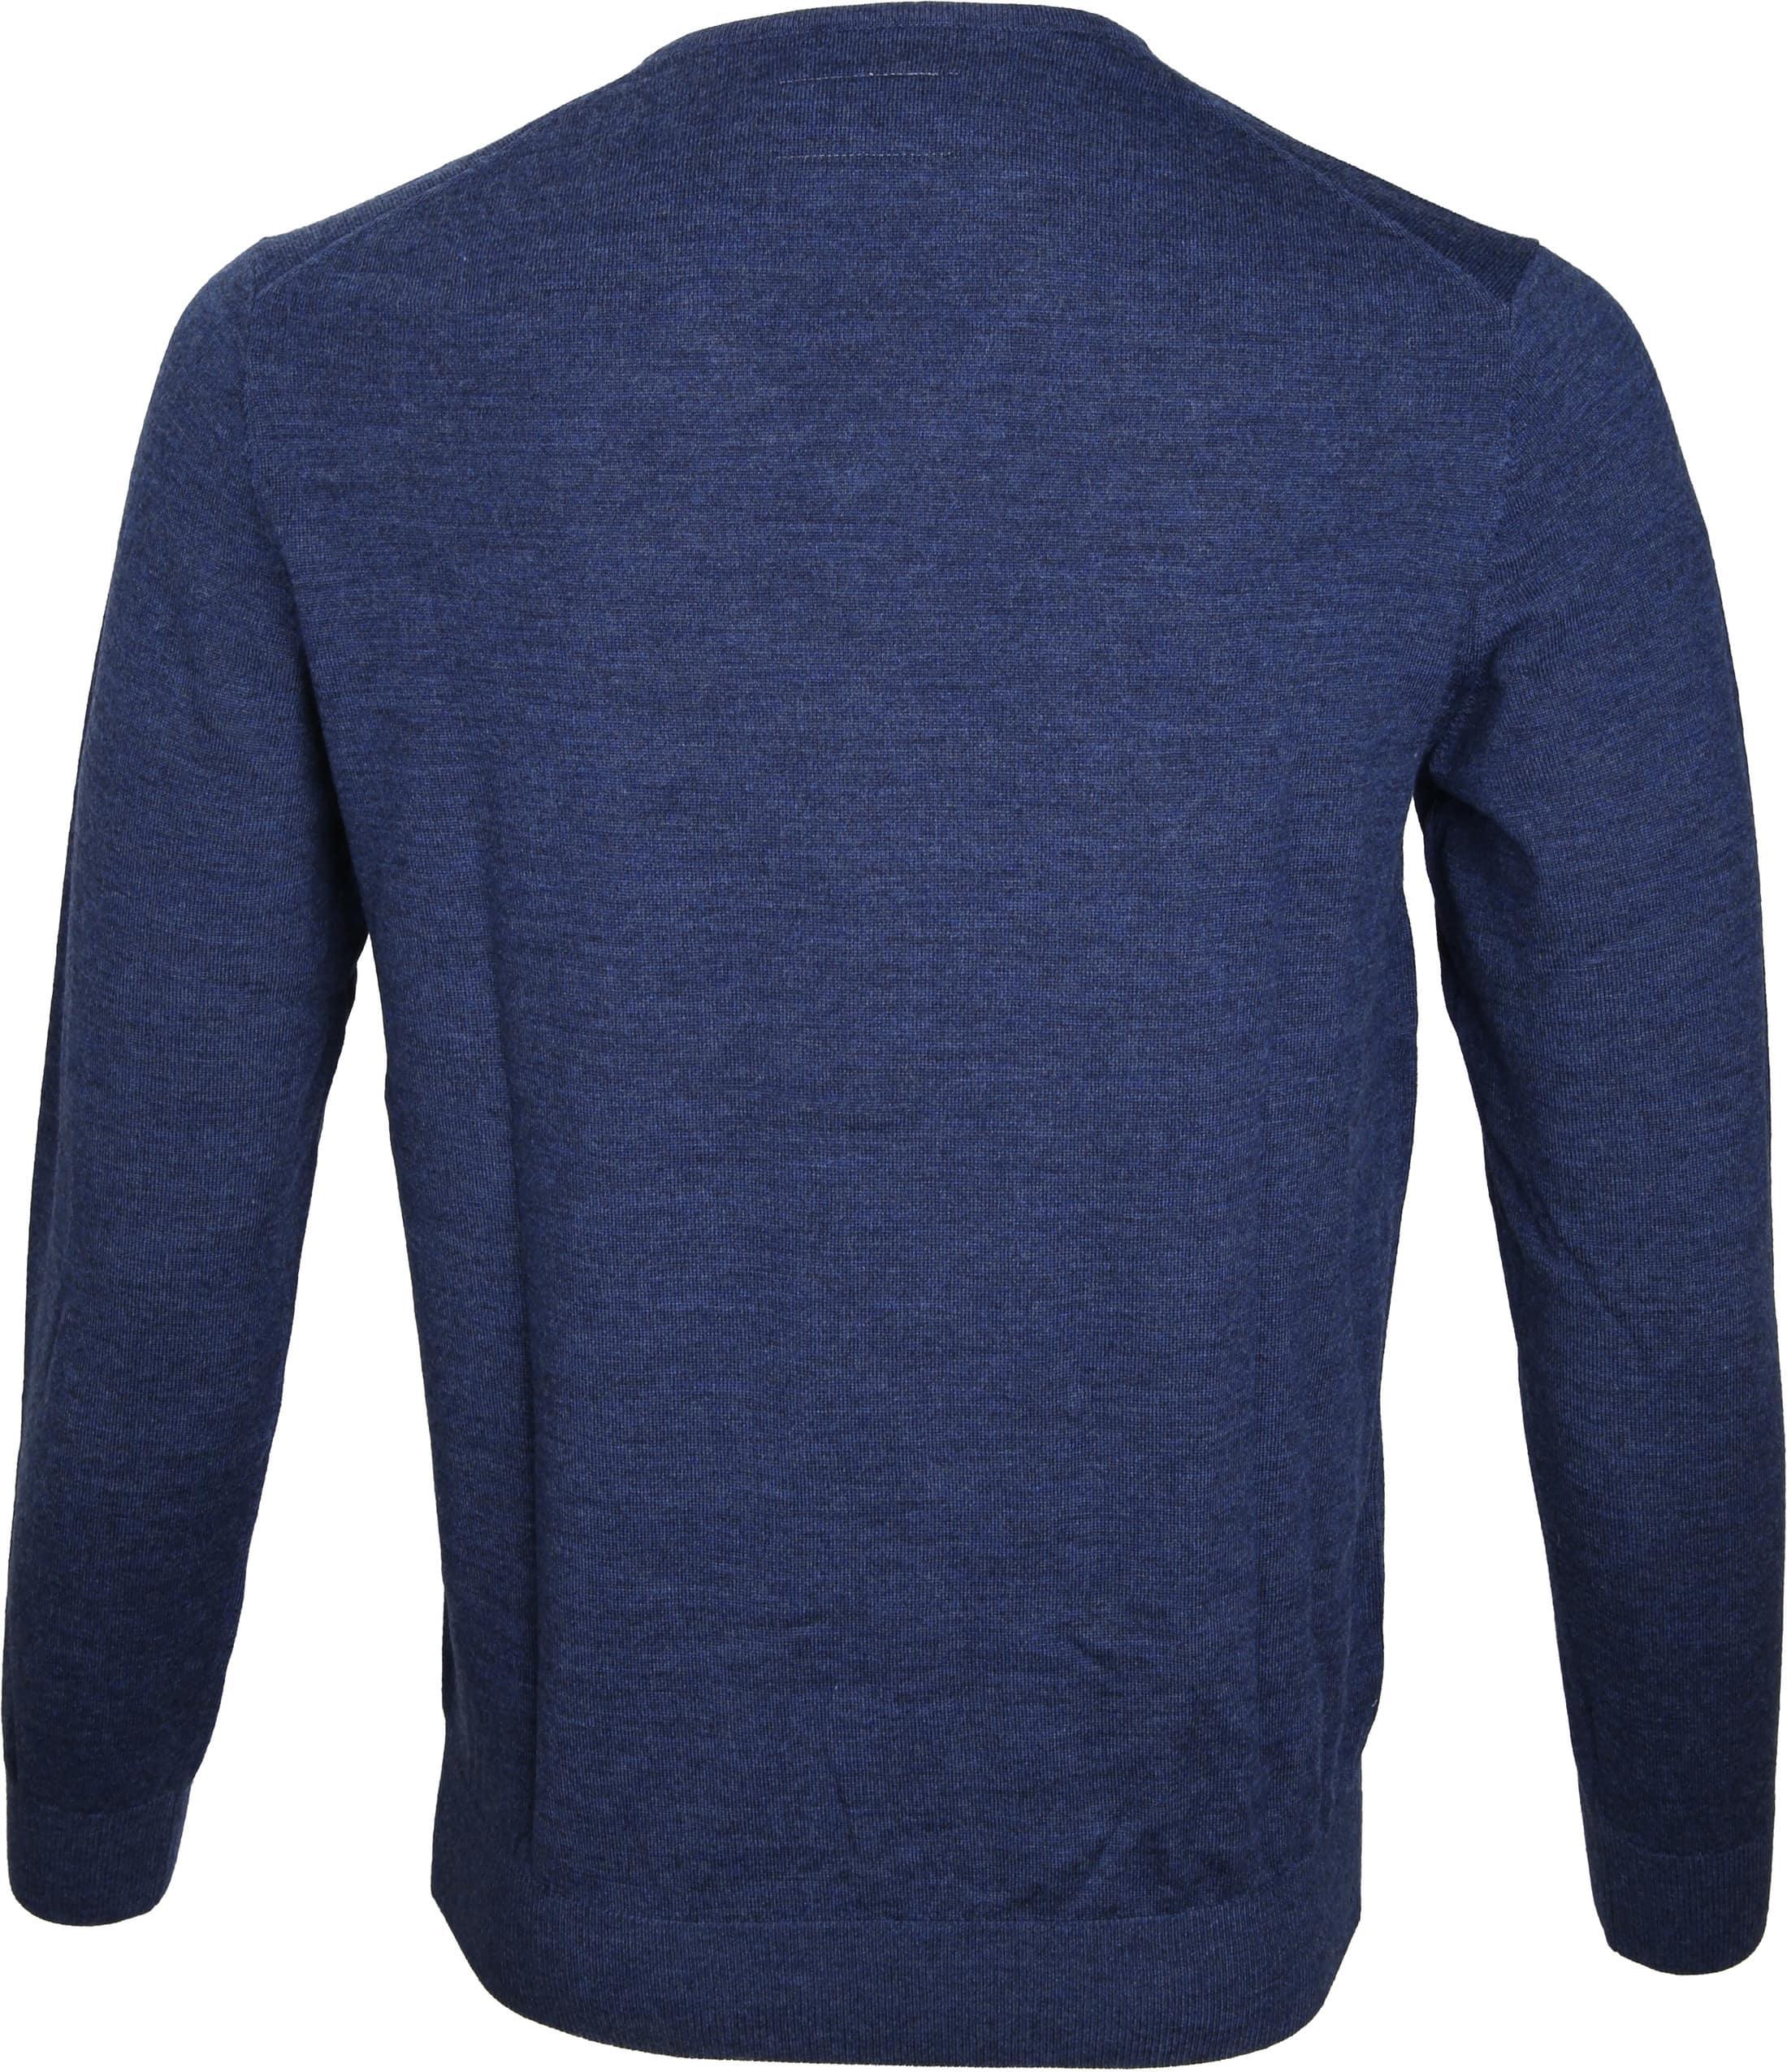 Suitable Prestige Pullover V-hals Navy foto 3